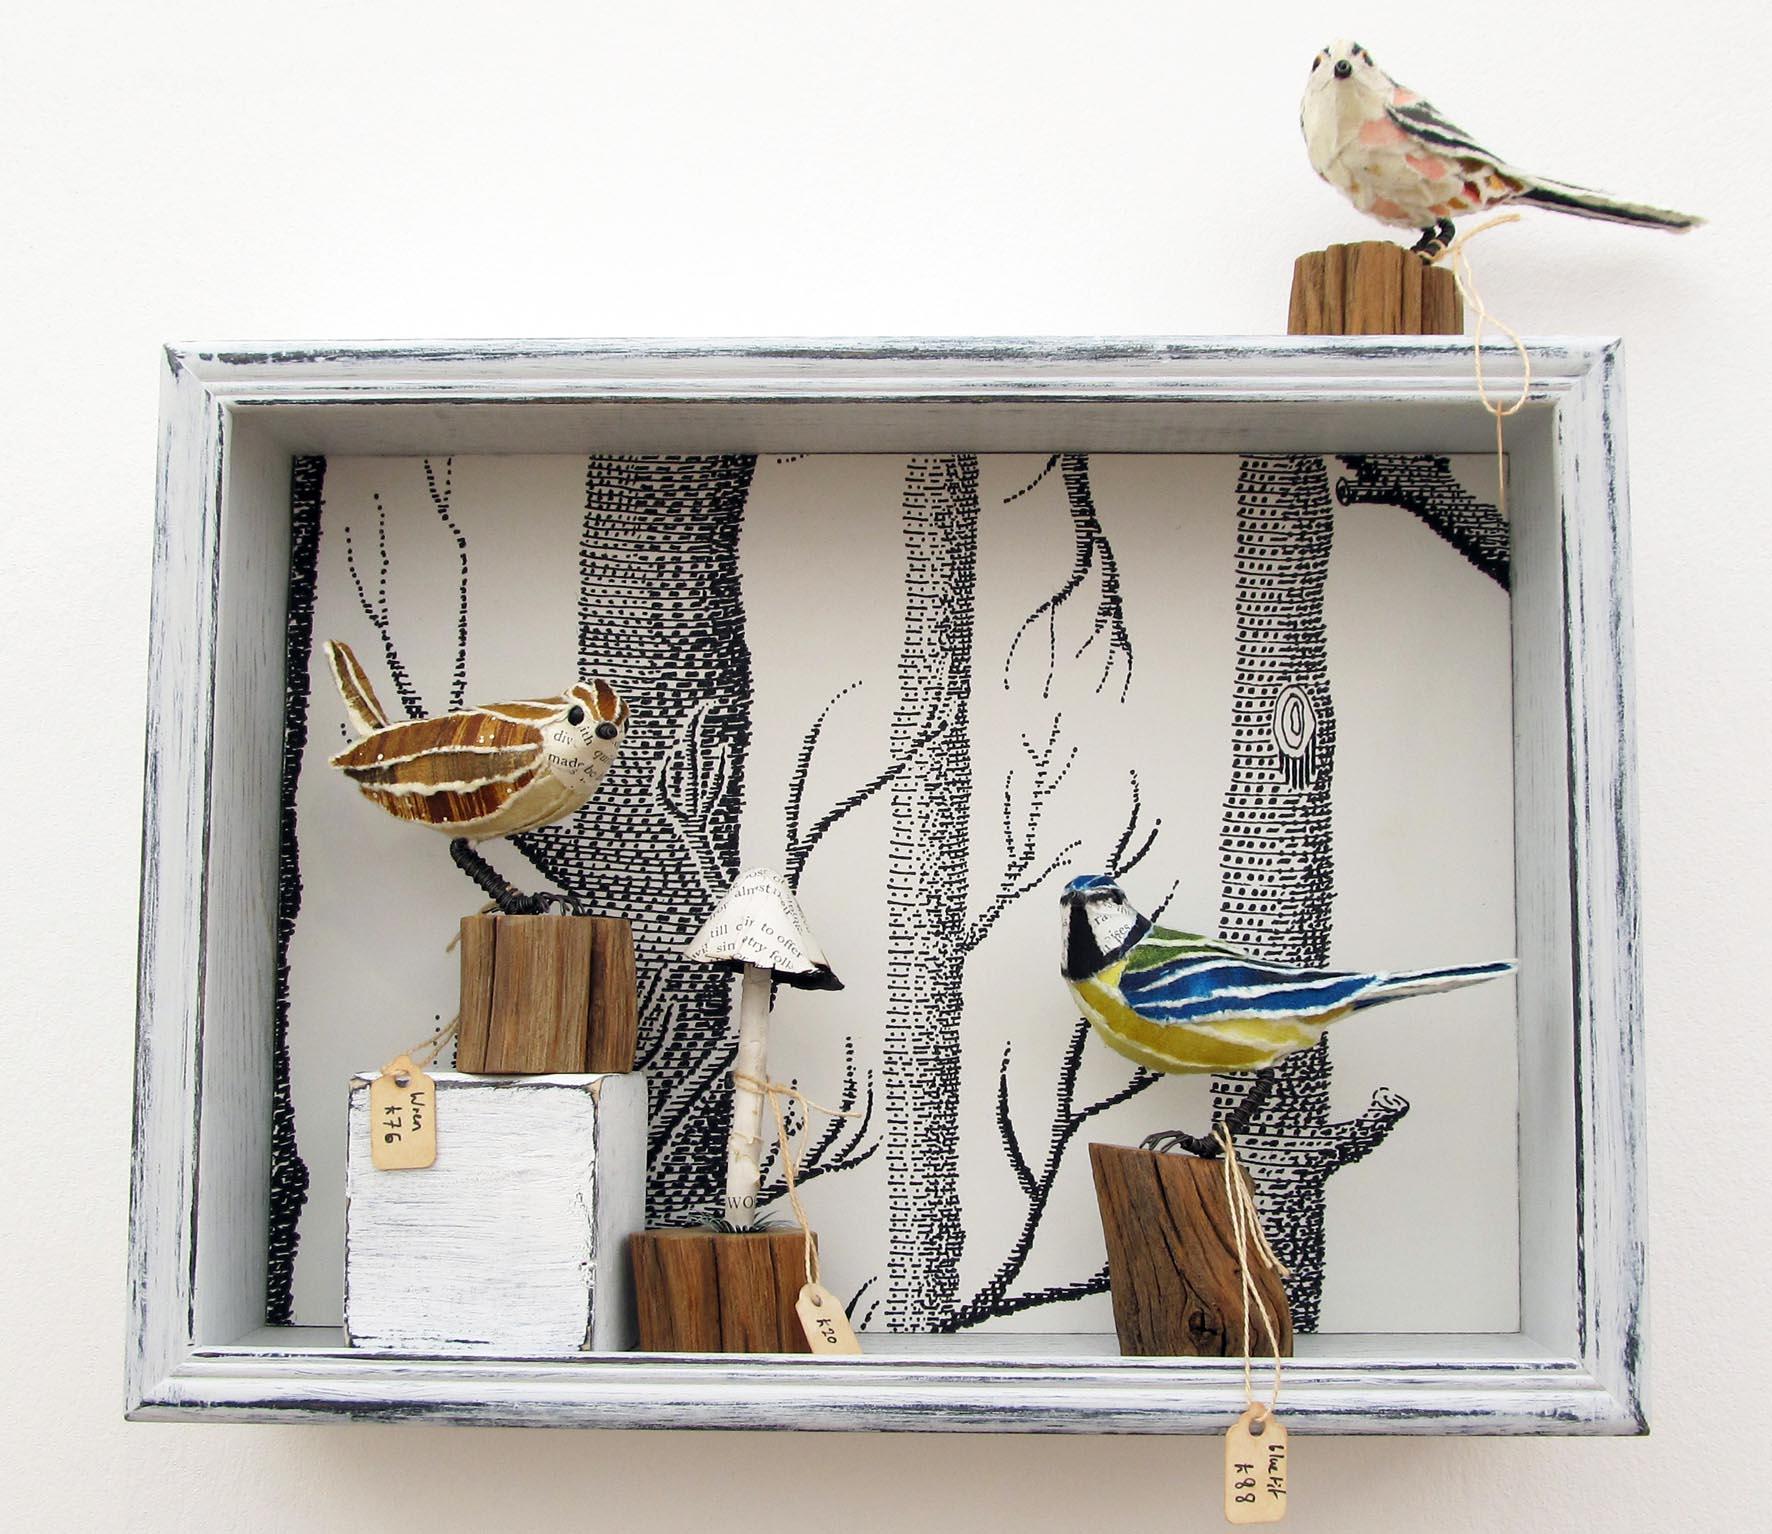 Suzanne-Breakwell-paper-sculpture.jpg